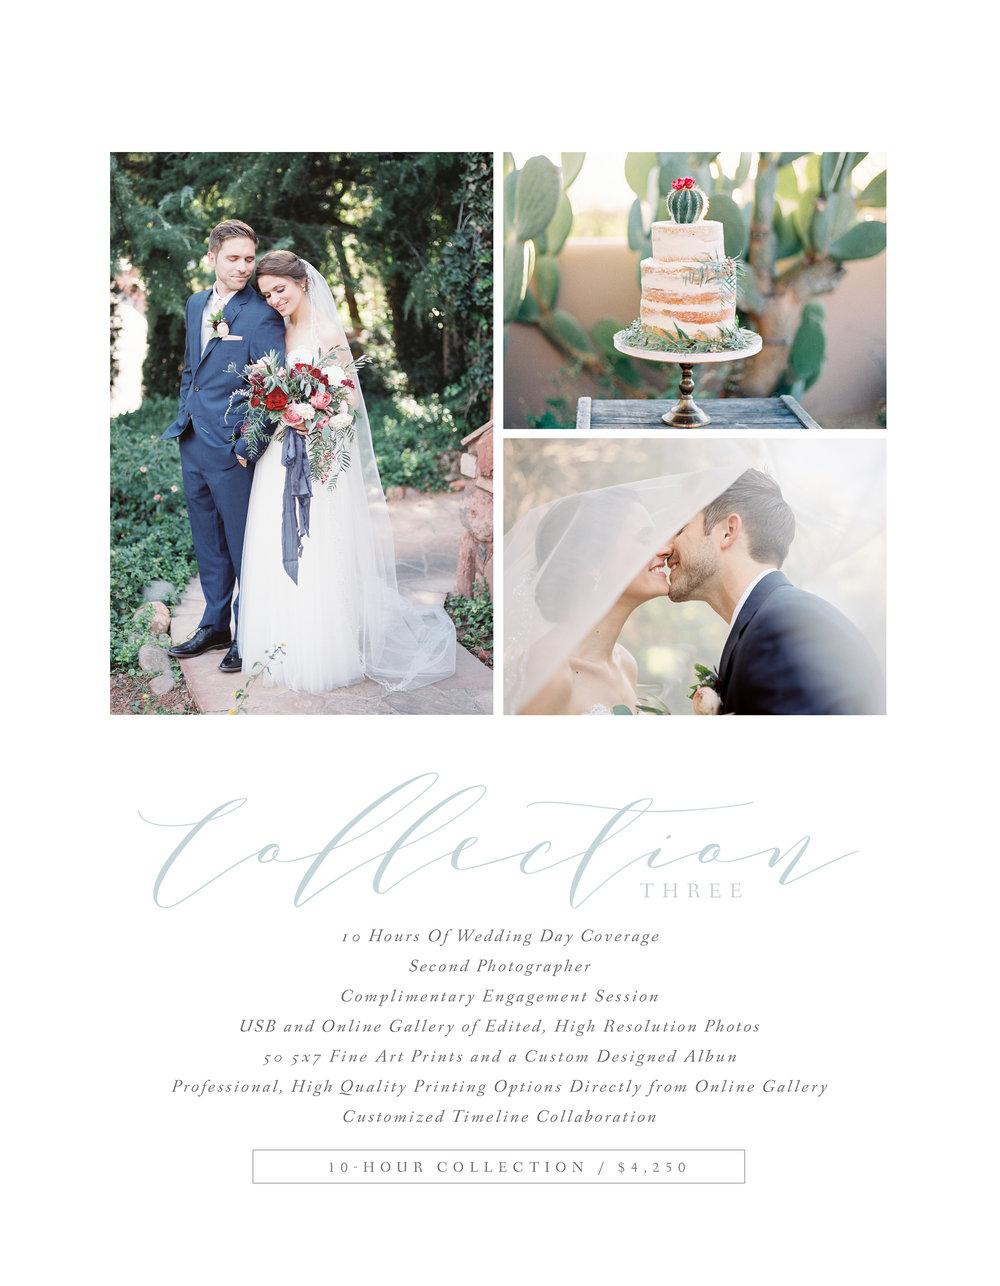 5Sarah Jane Photography Wedding Pricing 2017-2018.jpg